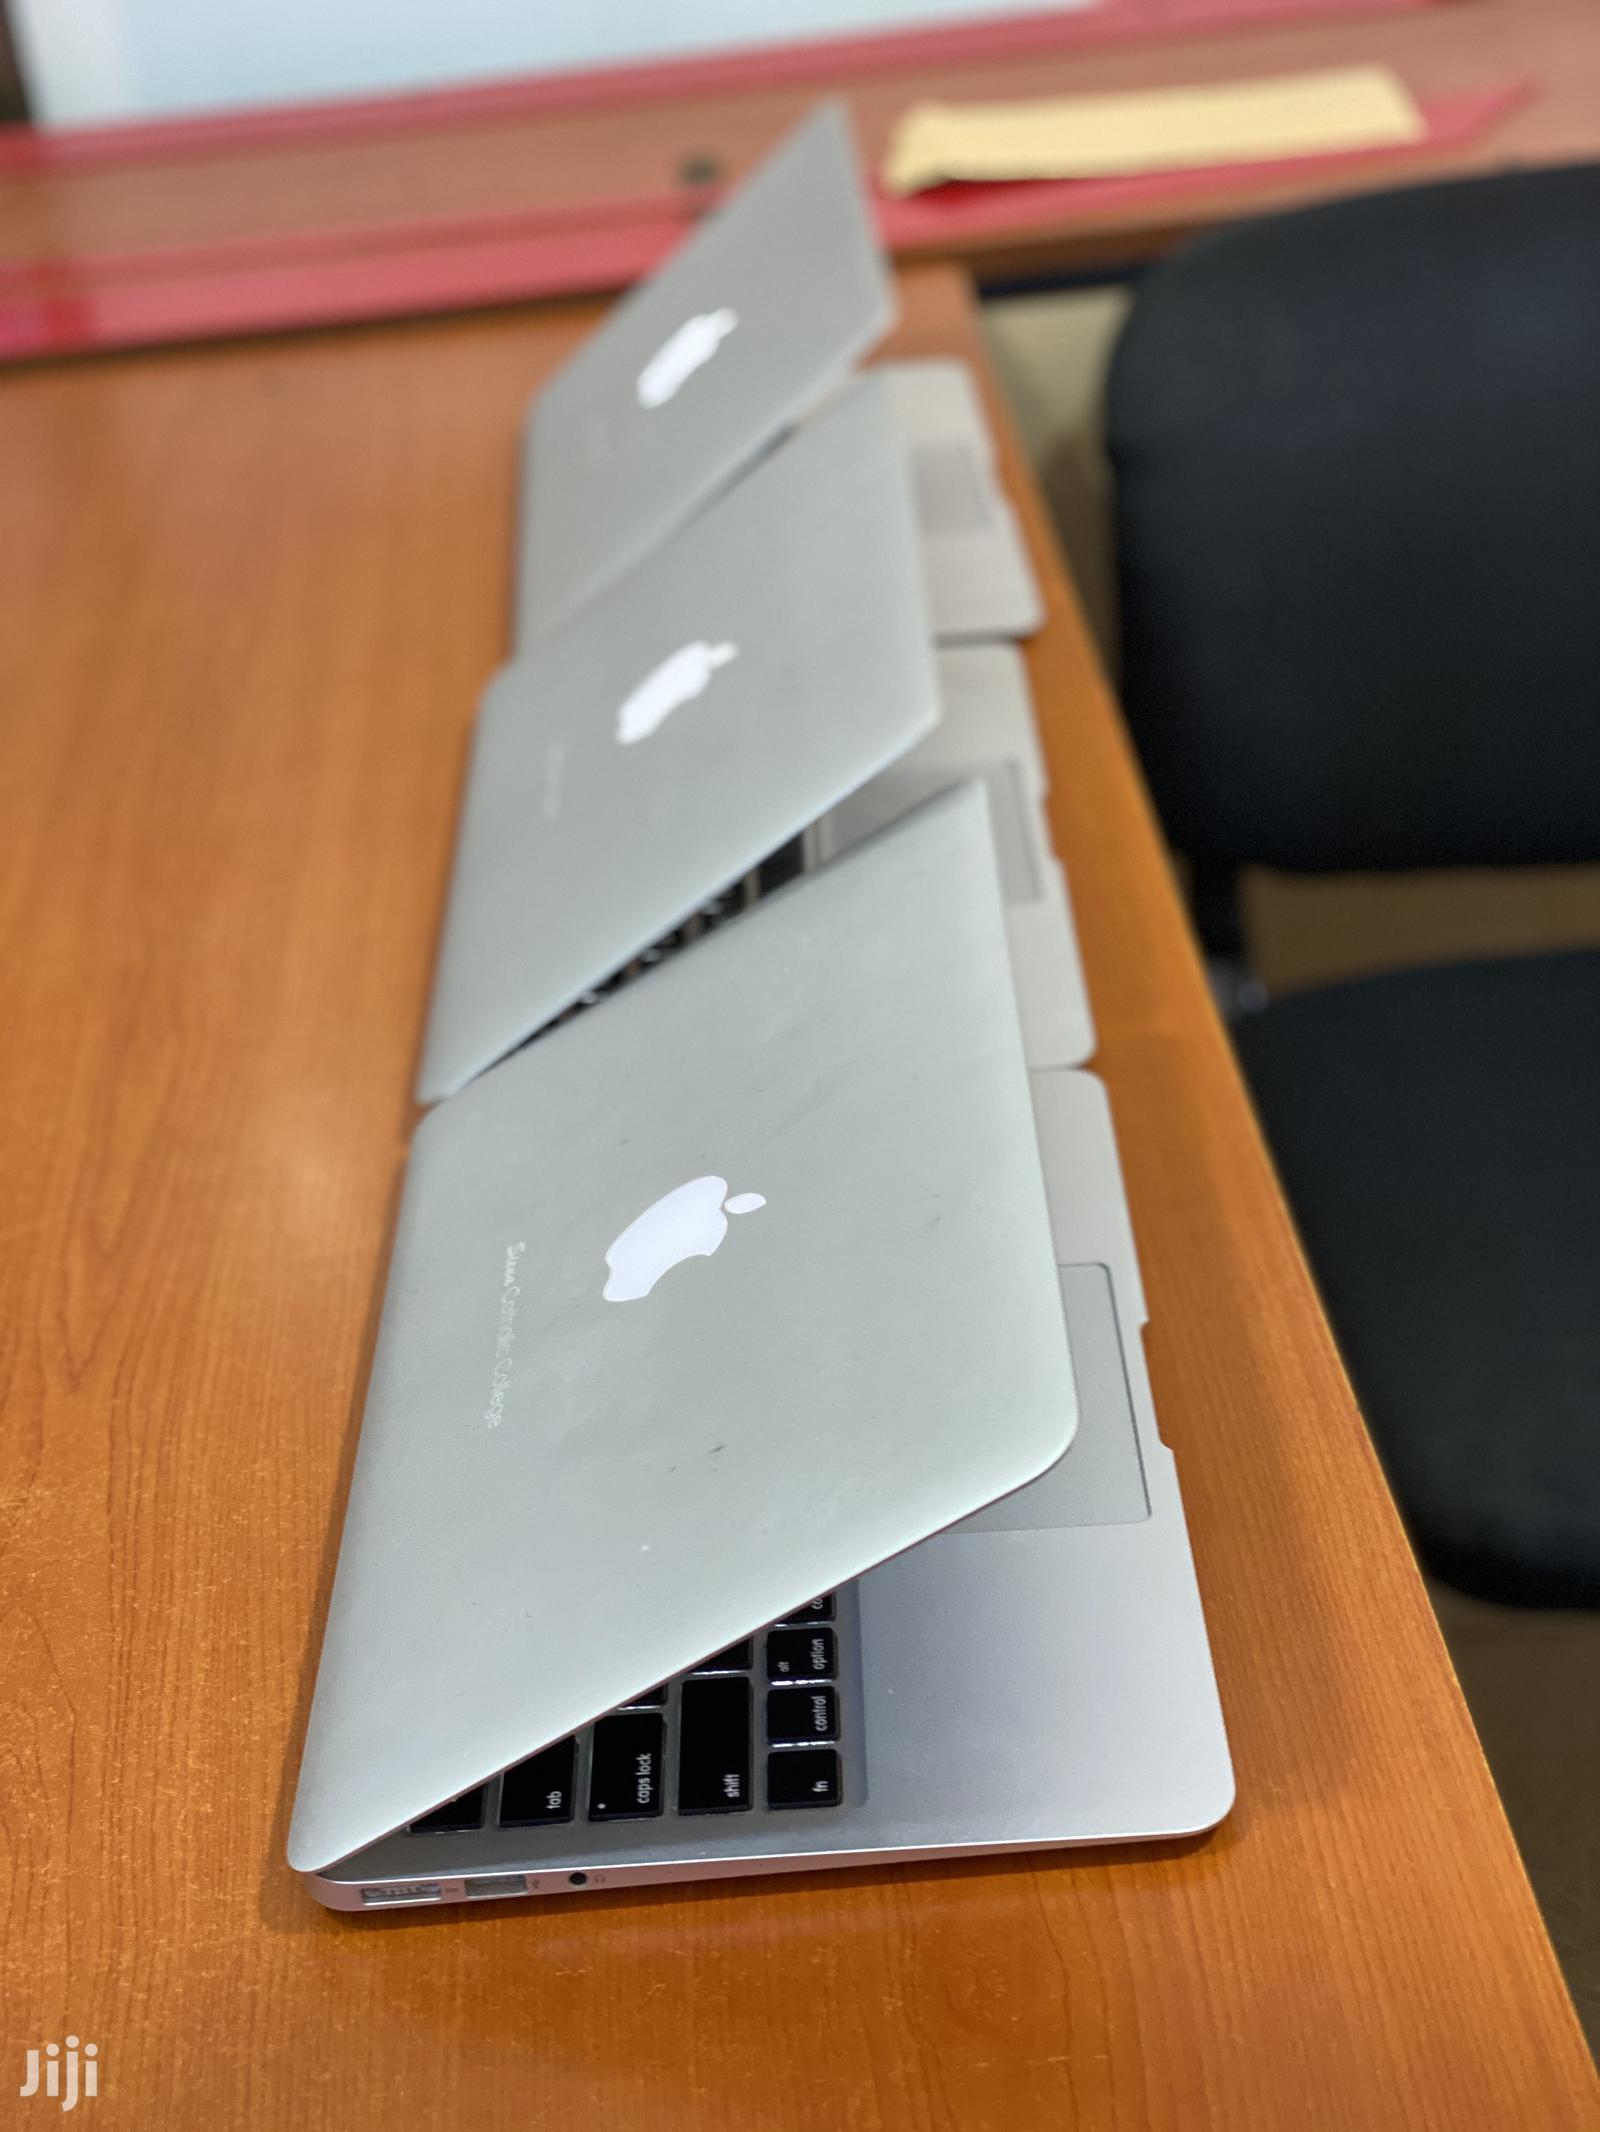 Laptop Apple MacBook Air 4GB Intel Core i5 SSHD (Hybrid) 128GB | Laptops & Computers for sale in Kampala, Central Region, Uganda